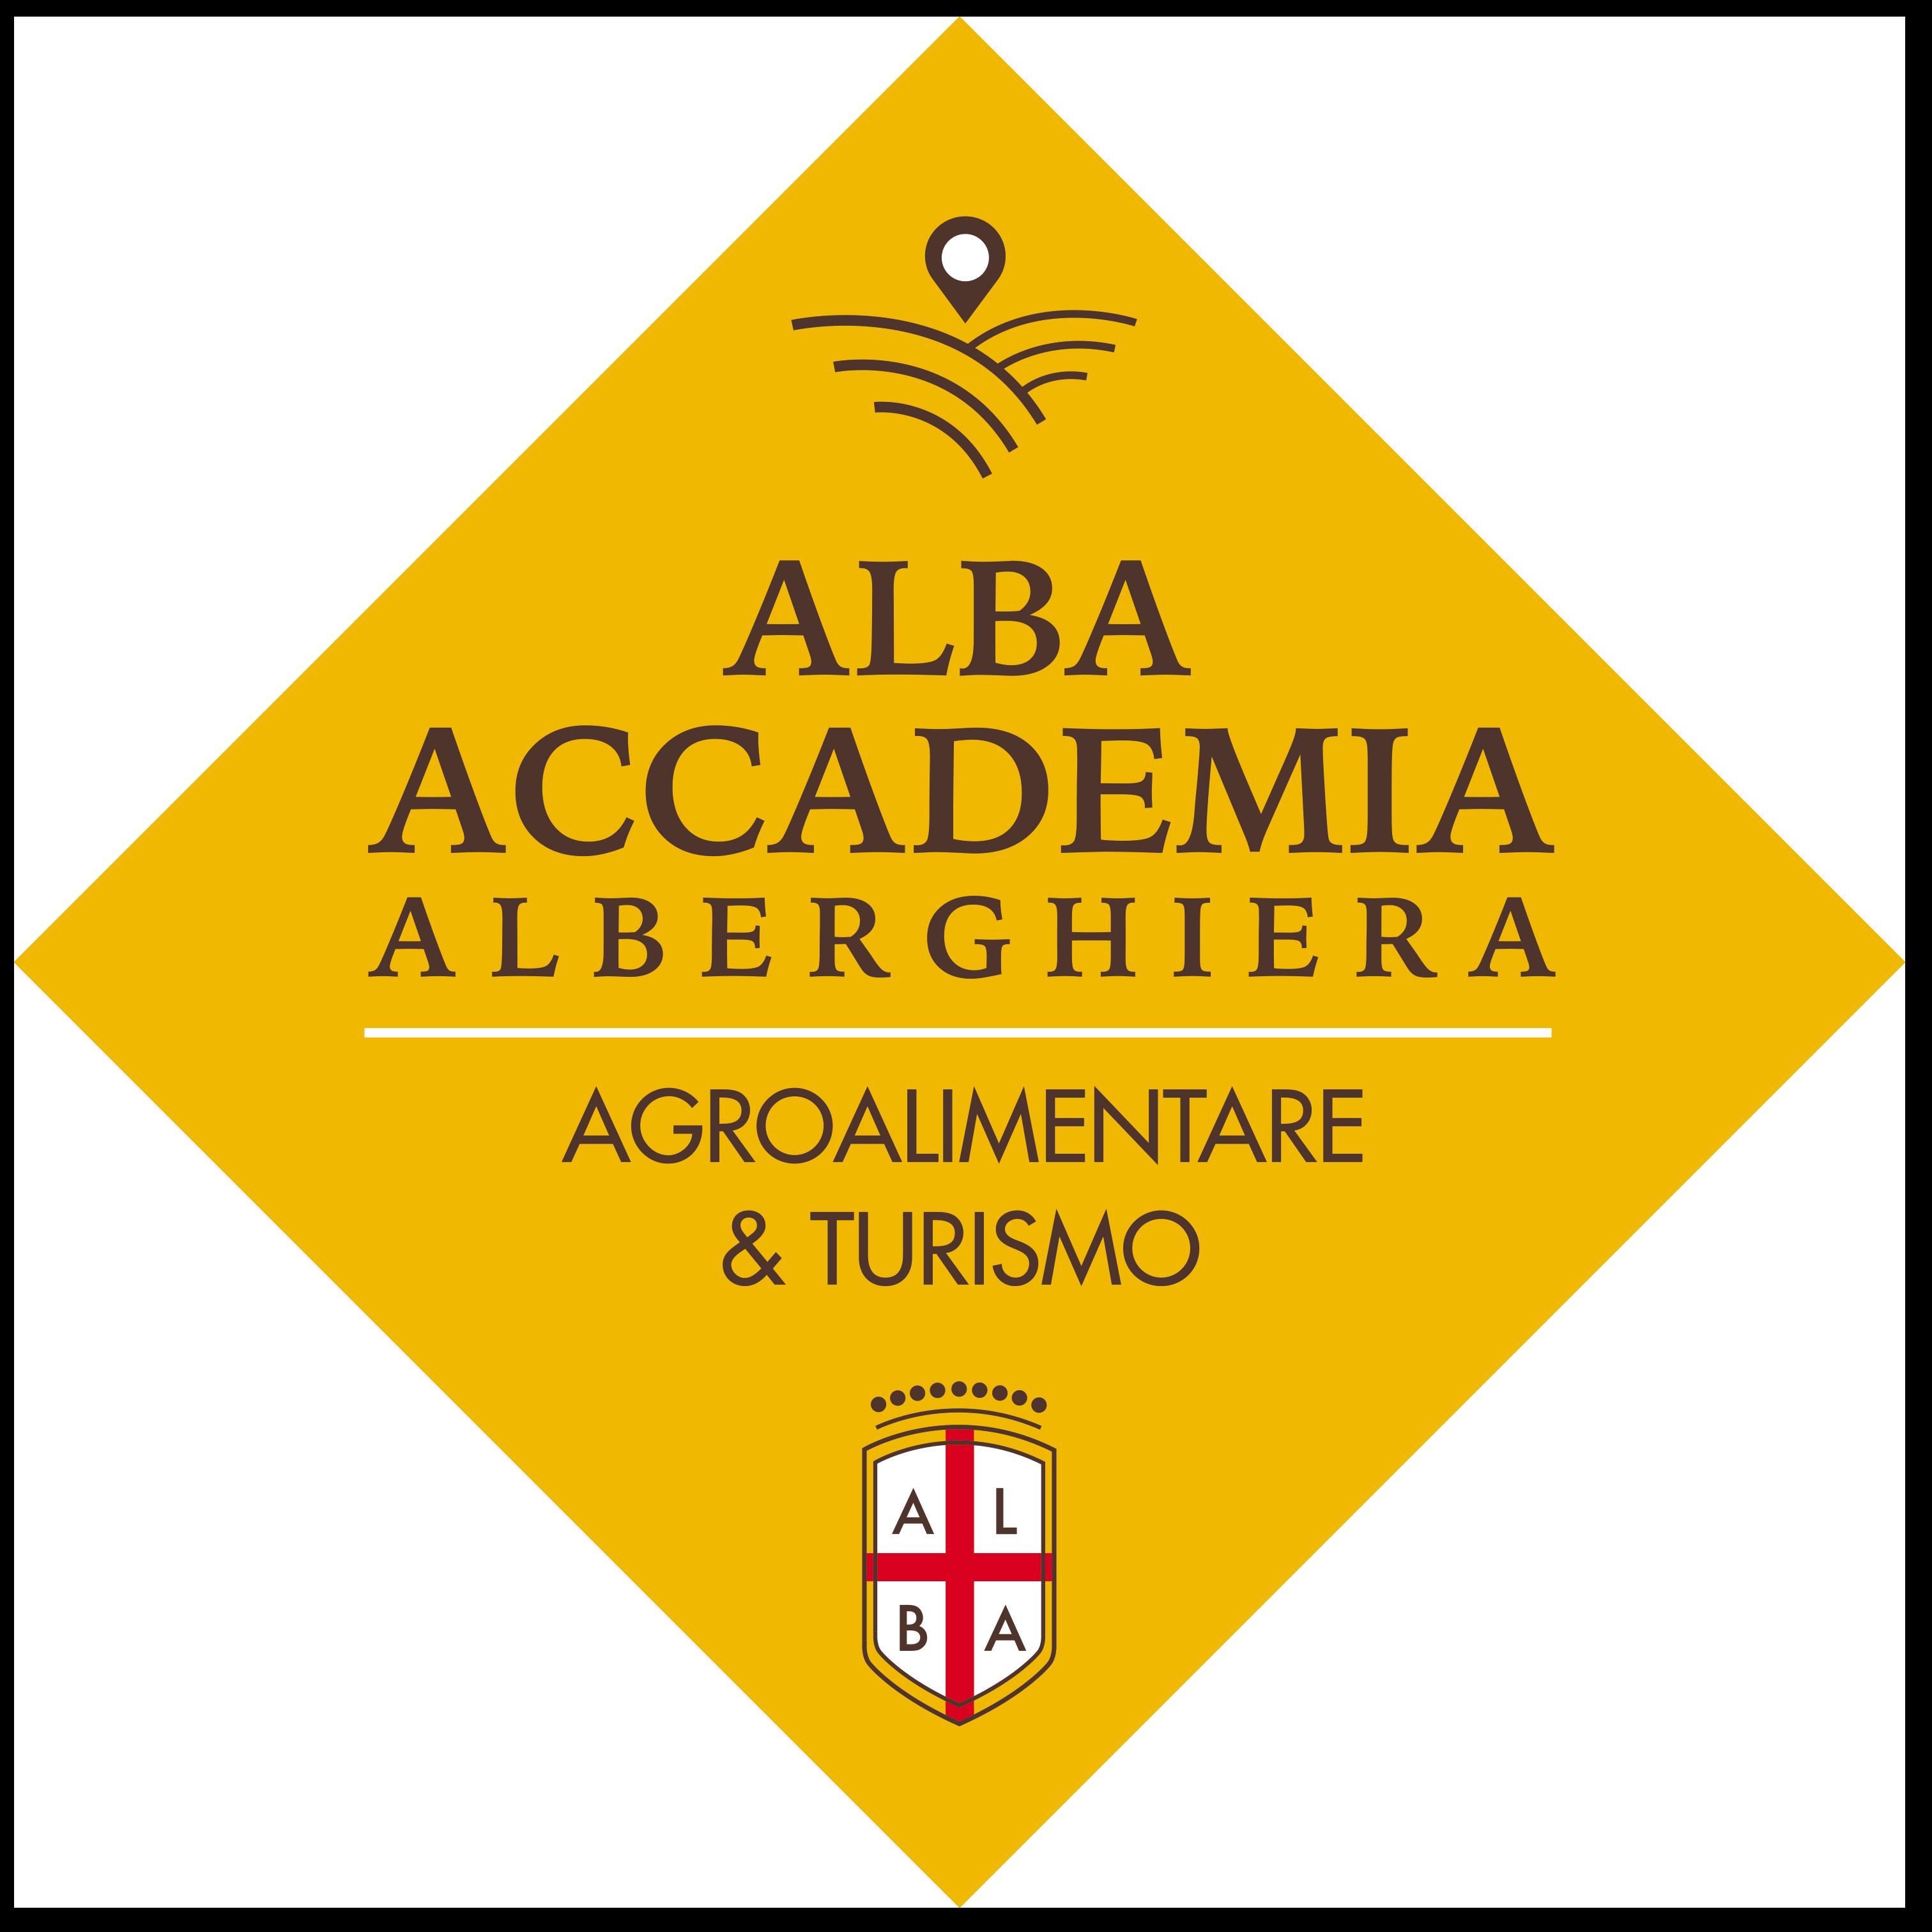 Accademia Alberghiera.png